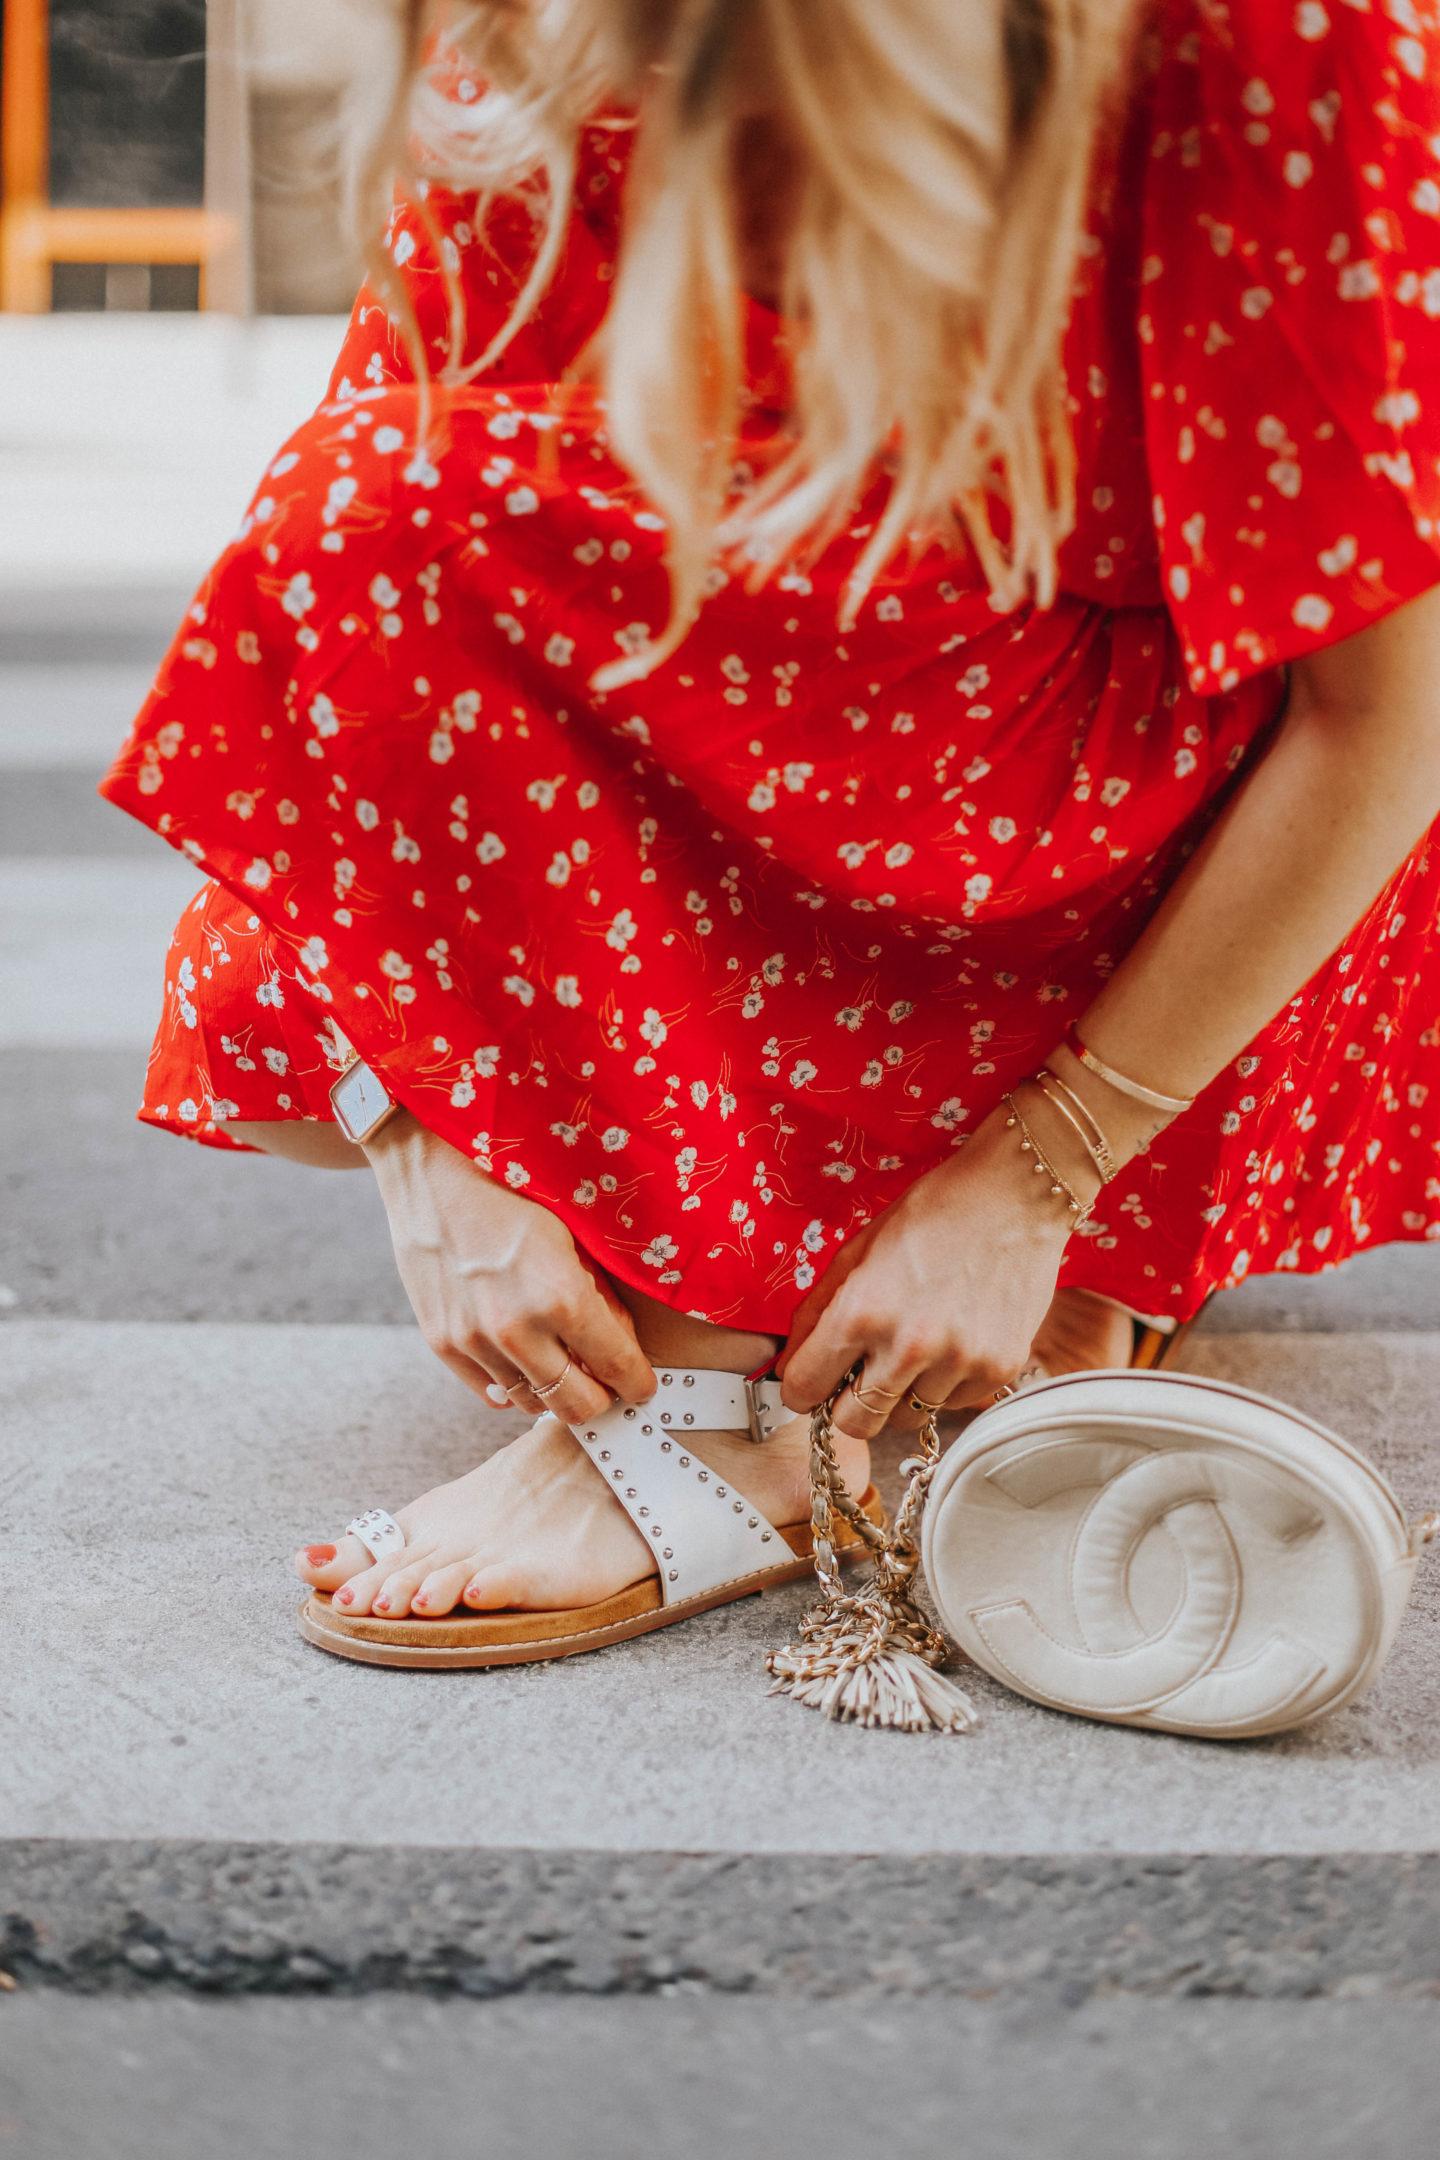 Chanel Vintage - Blondie Baby blog mode Paris et voyages